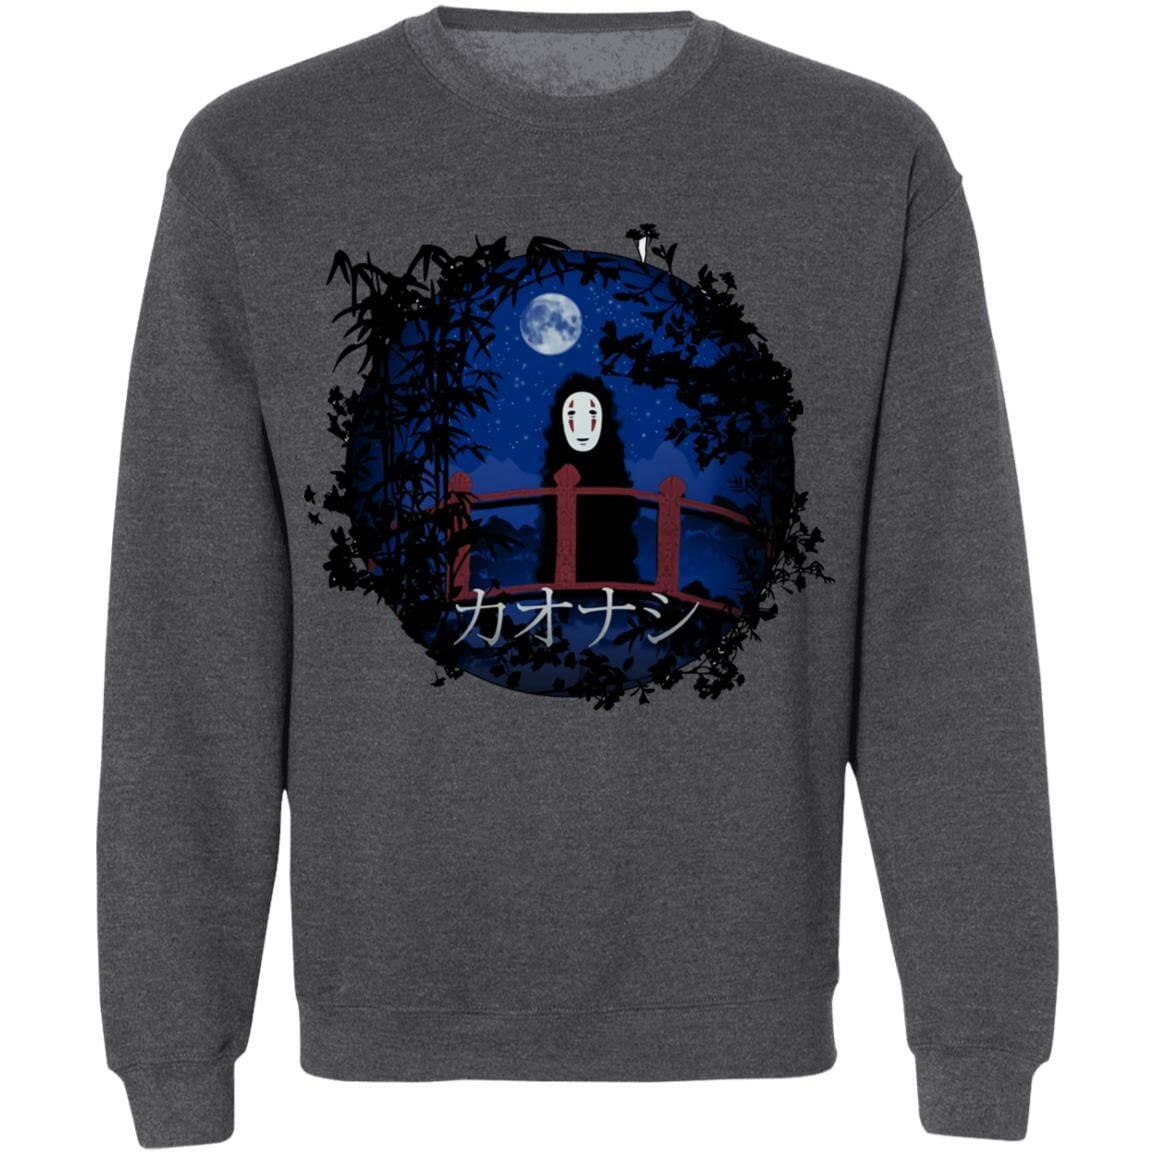 Spirited Away Kaonashi No Face by the blue Moon Sweatshirt